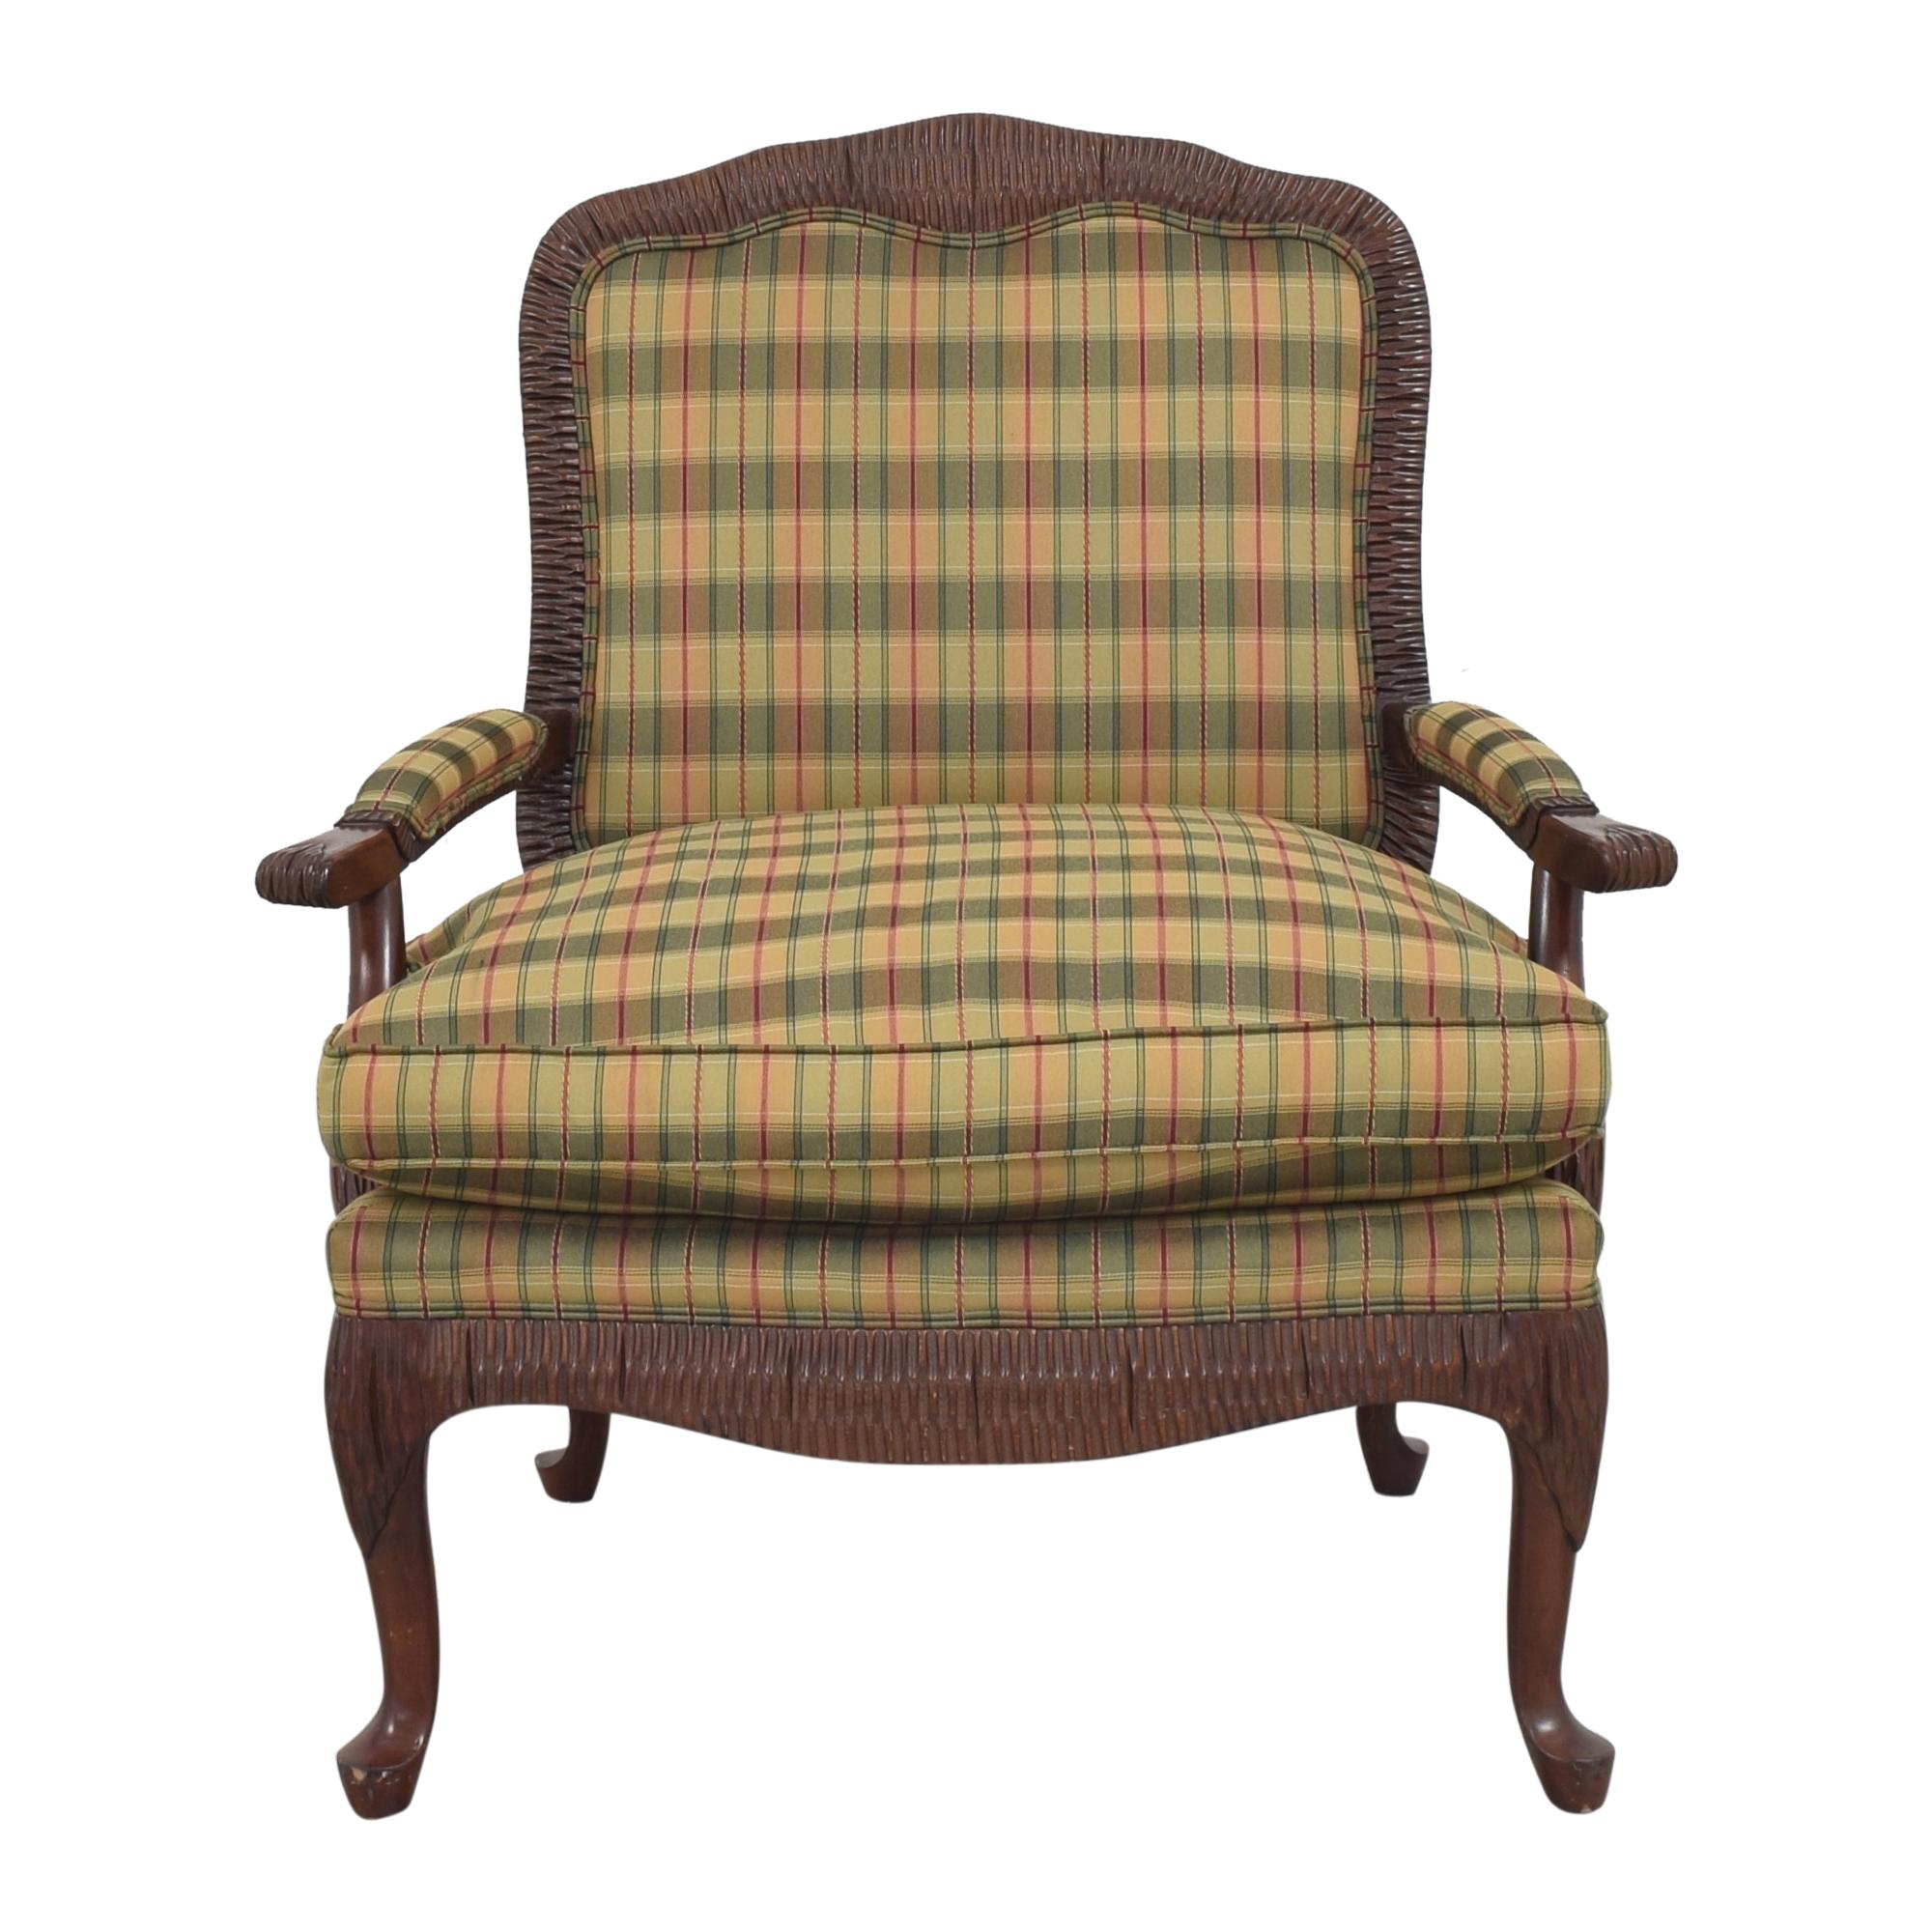 Lexington Furniture Lexington Furniture Upholstered Accent Chair pa